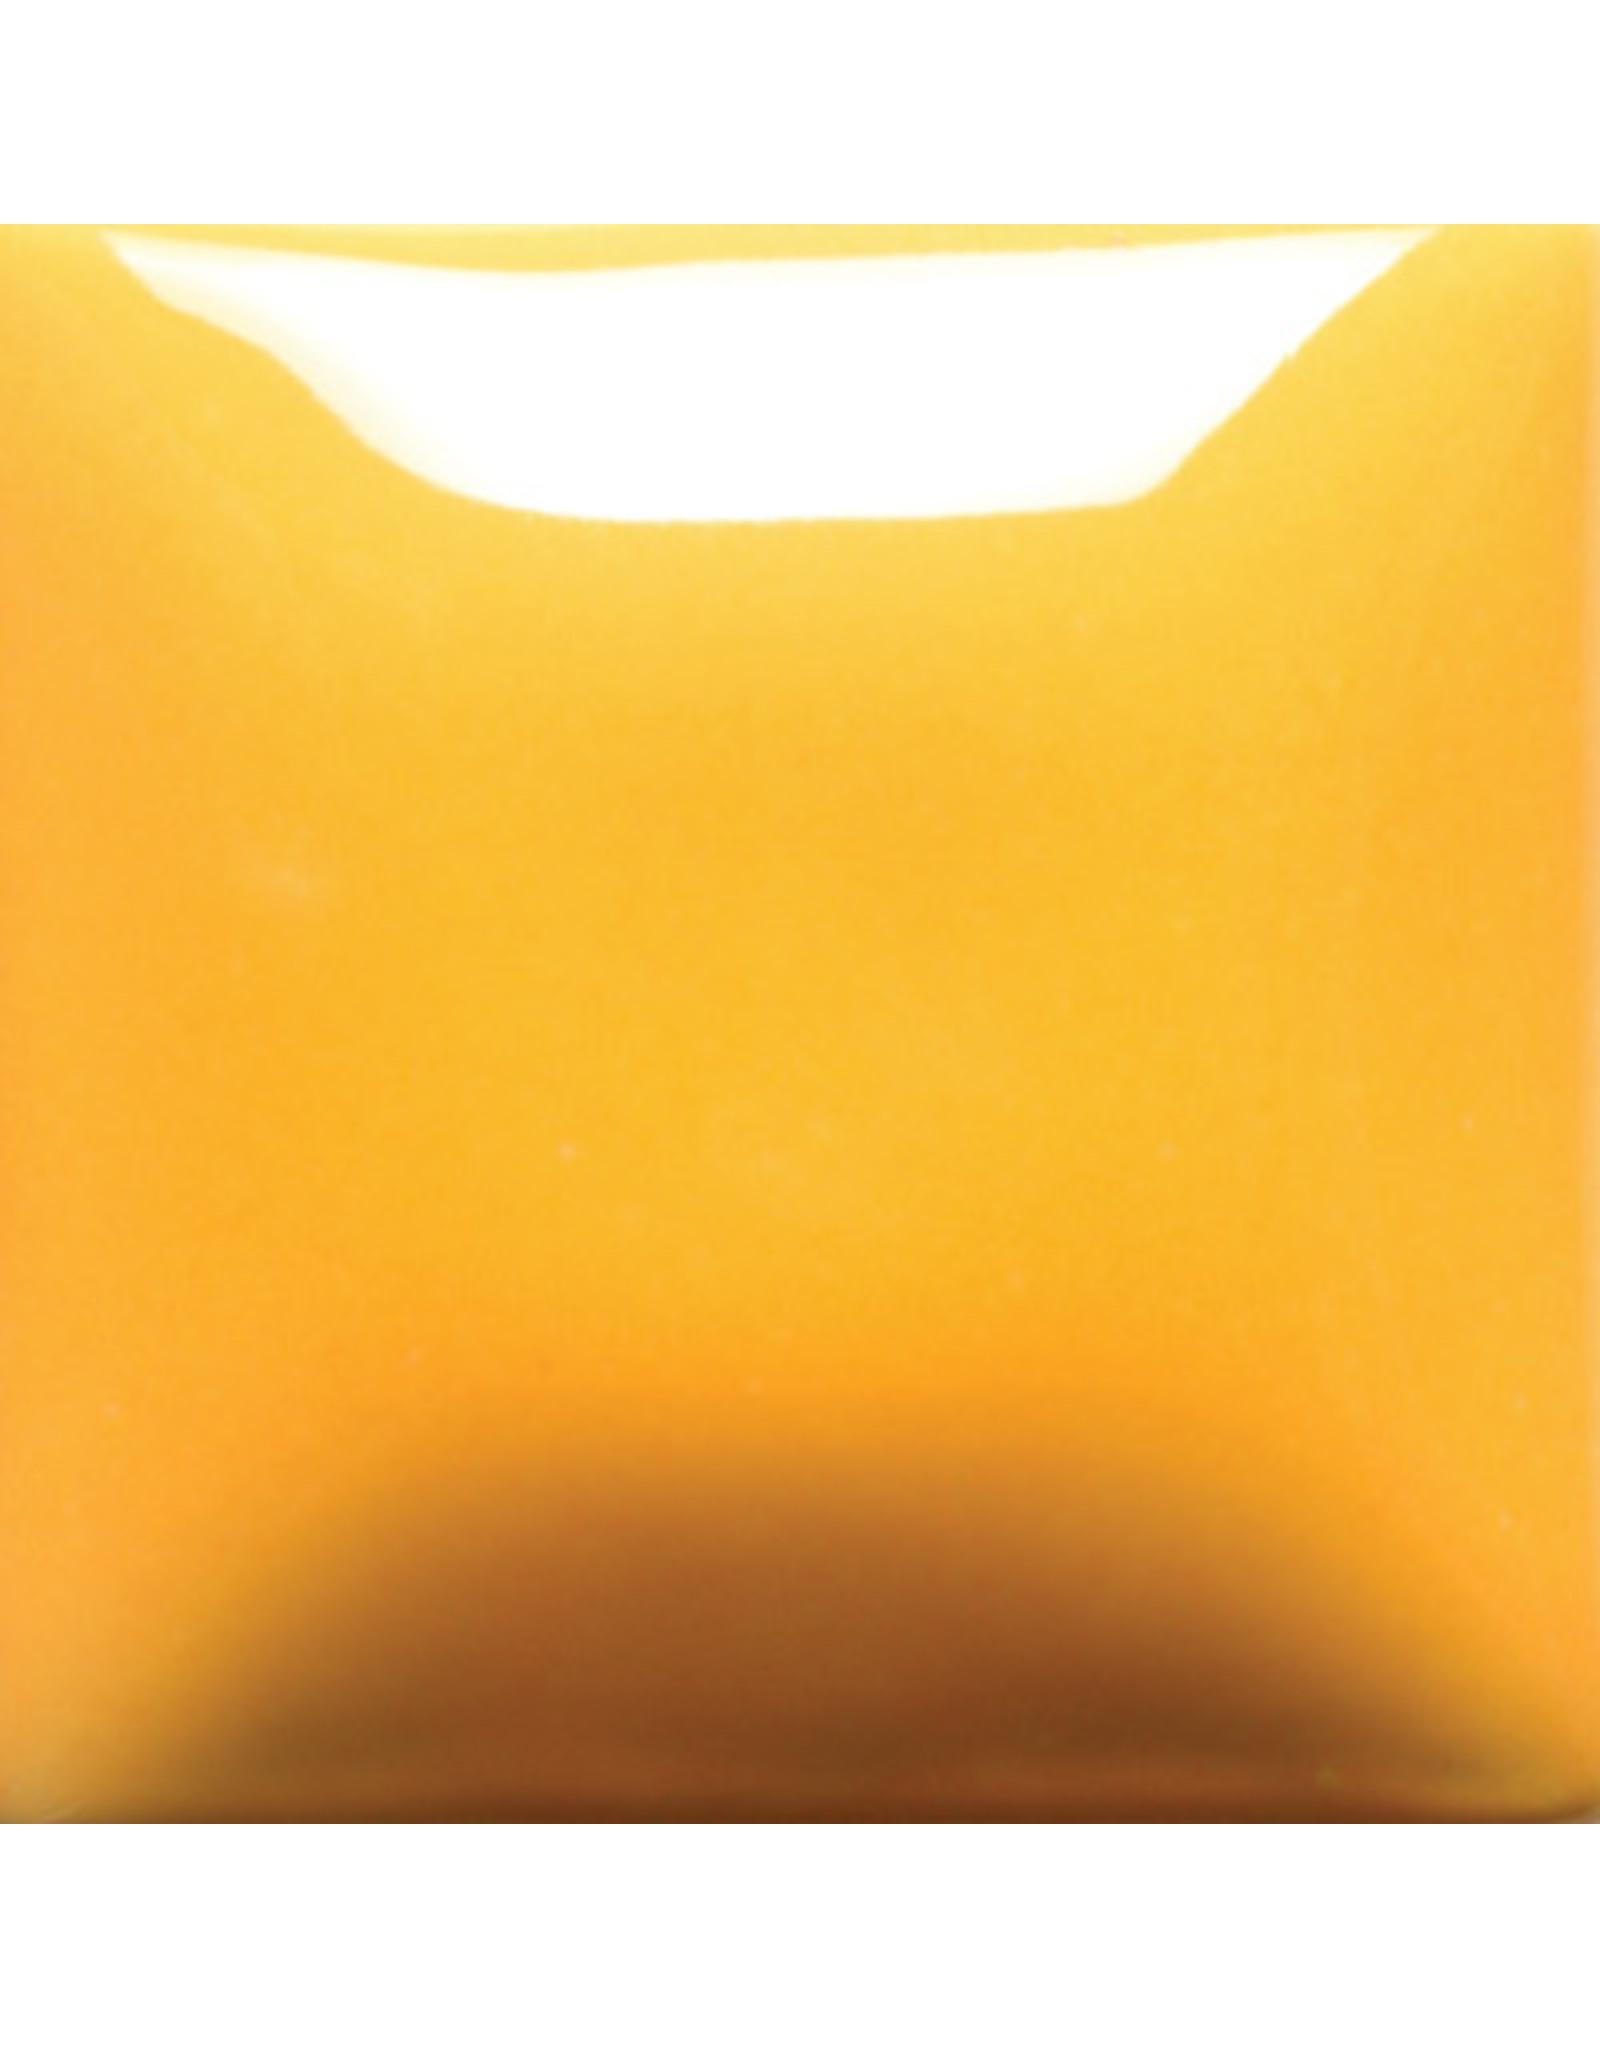 Mayco Mayco Foundations Yellow-orange 118ml